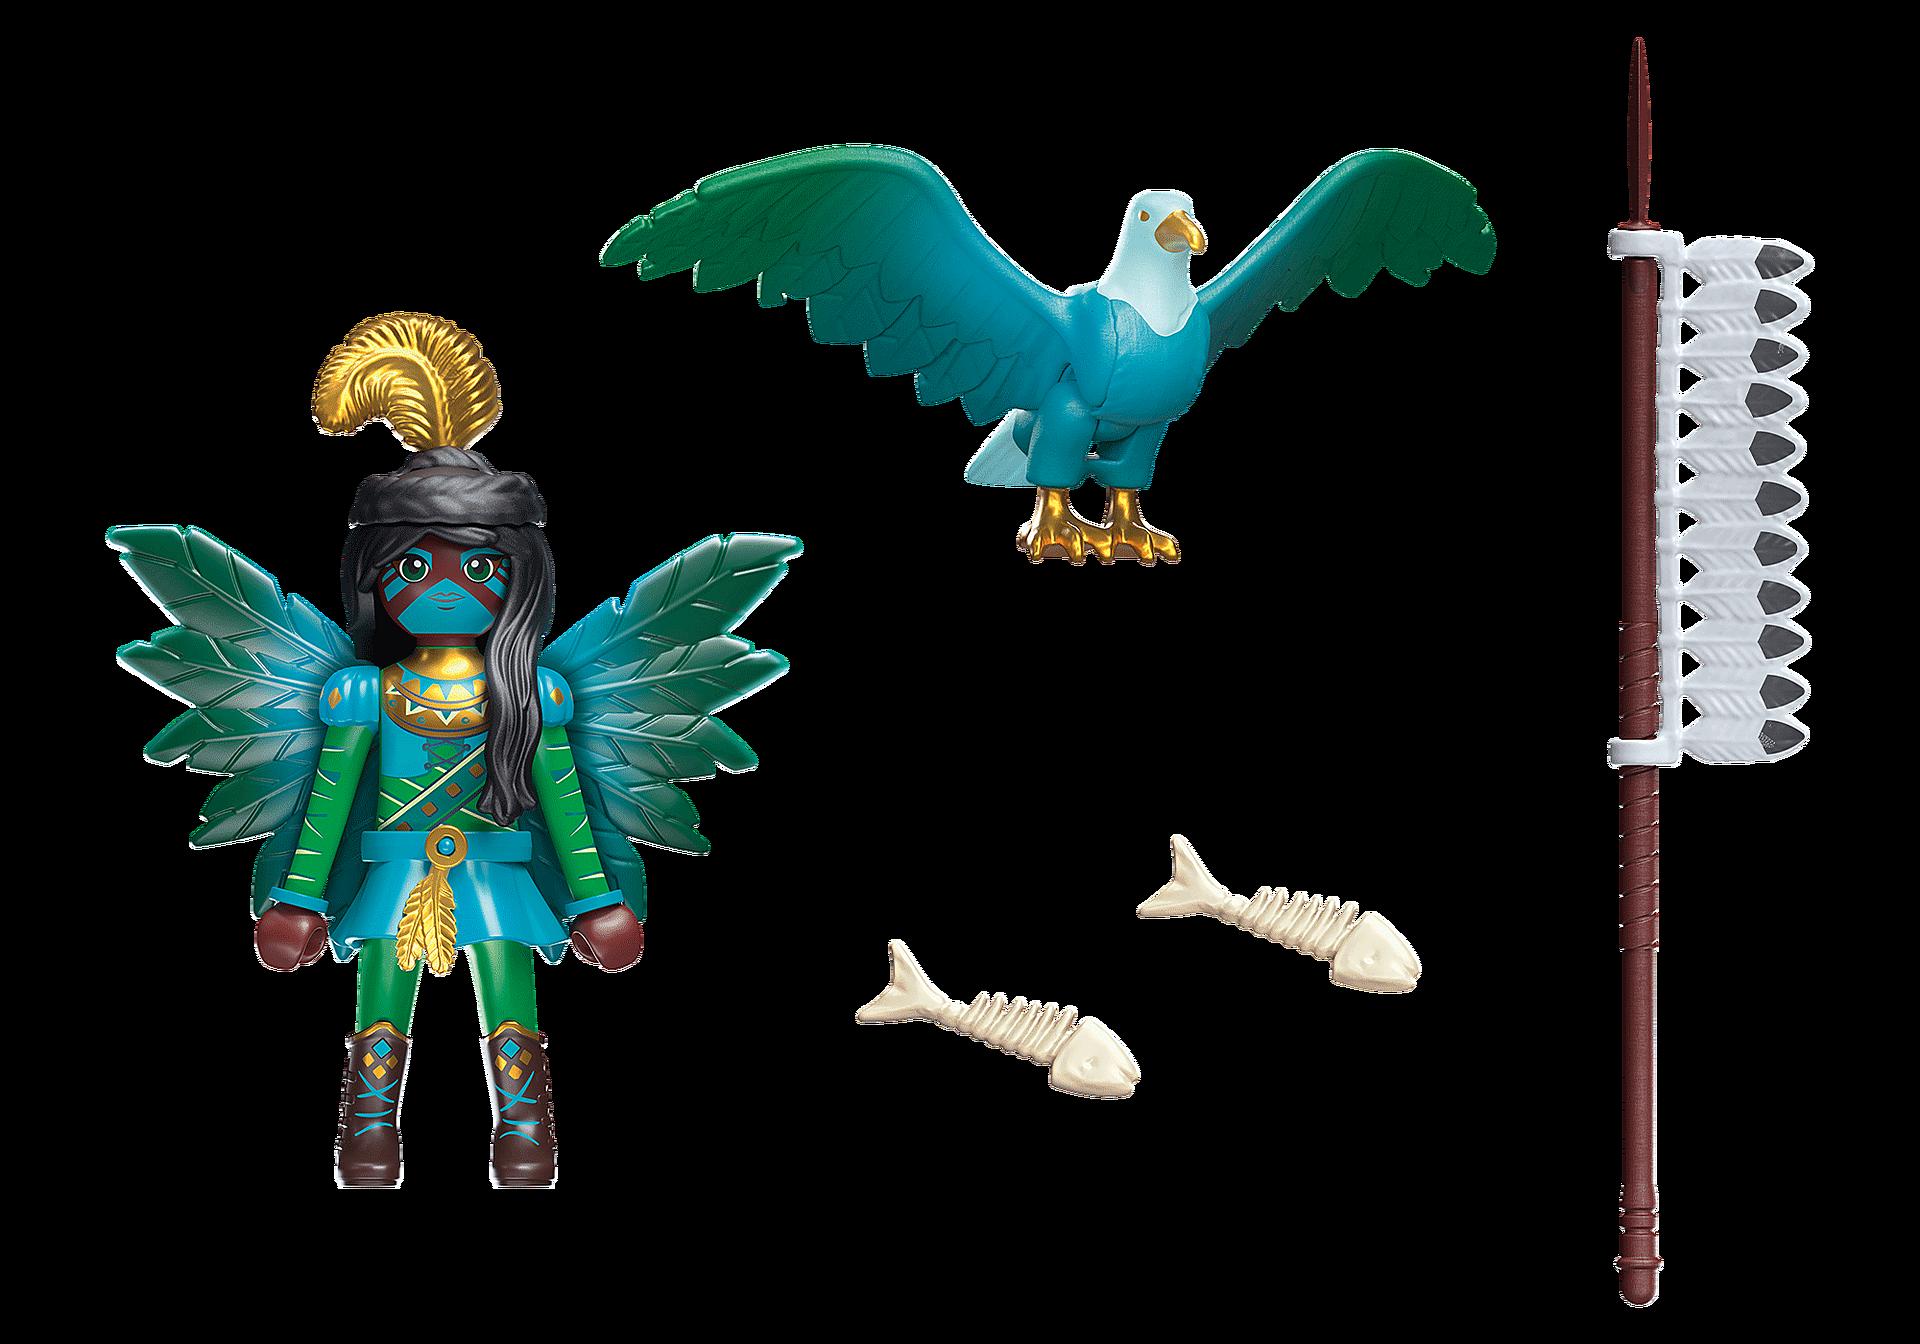 70802 Knight Fairy med totemdyr zoom image3